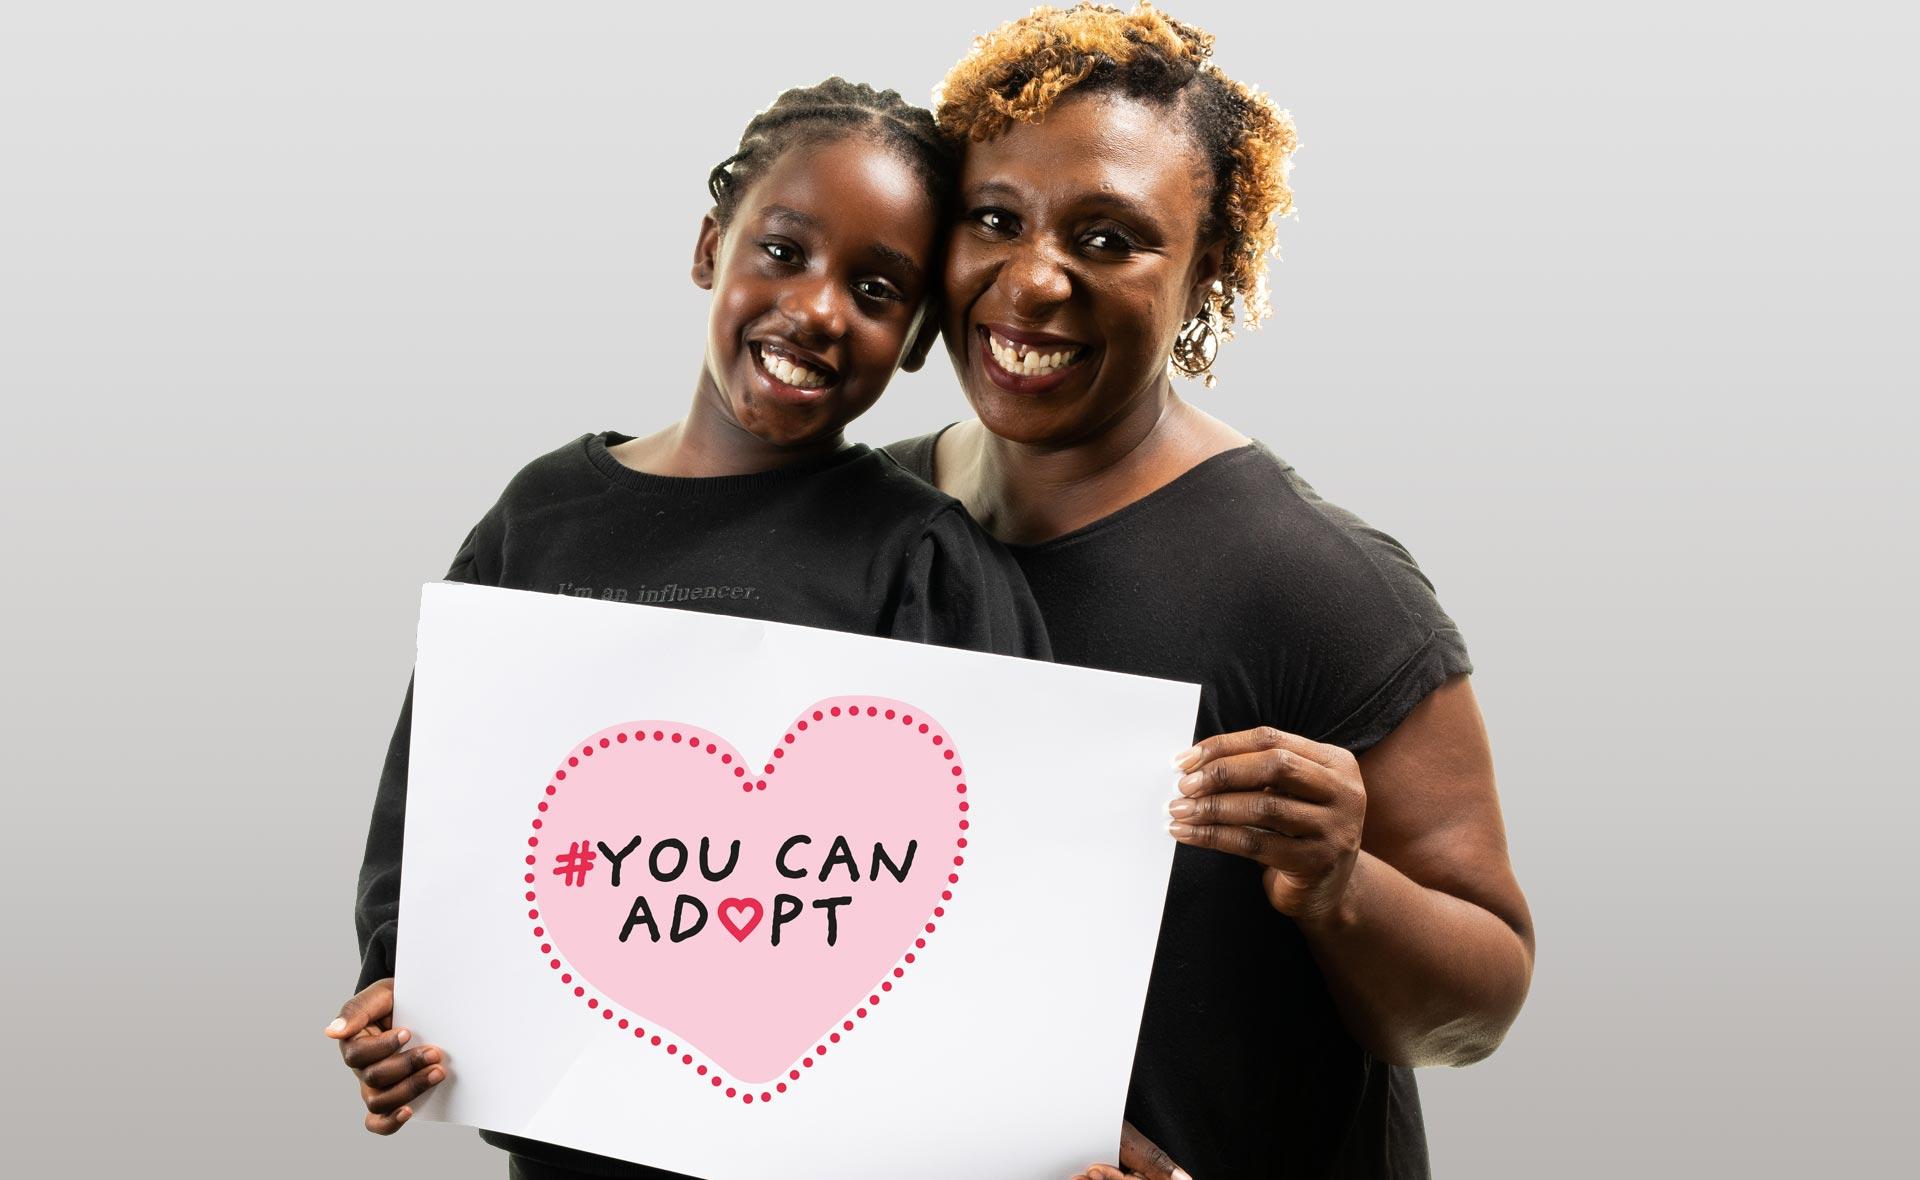 Fran's adoption story